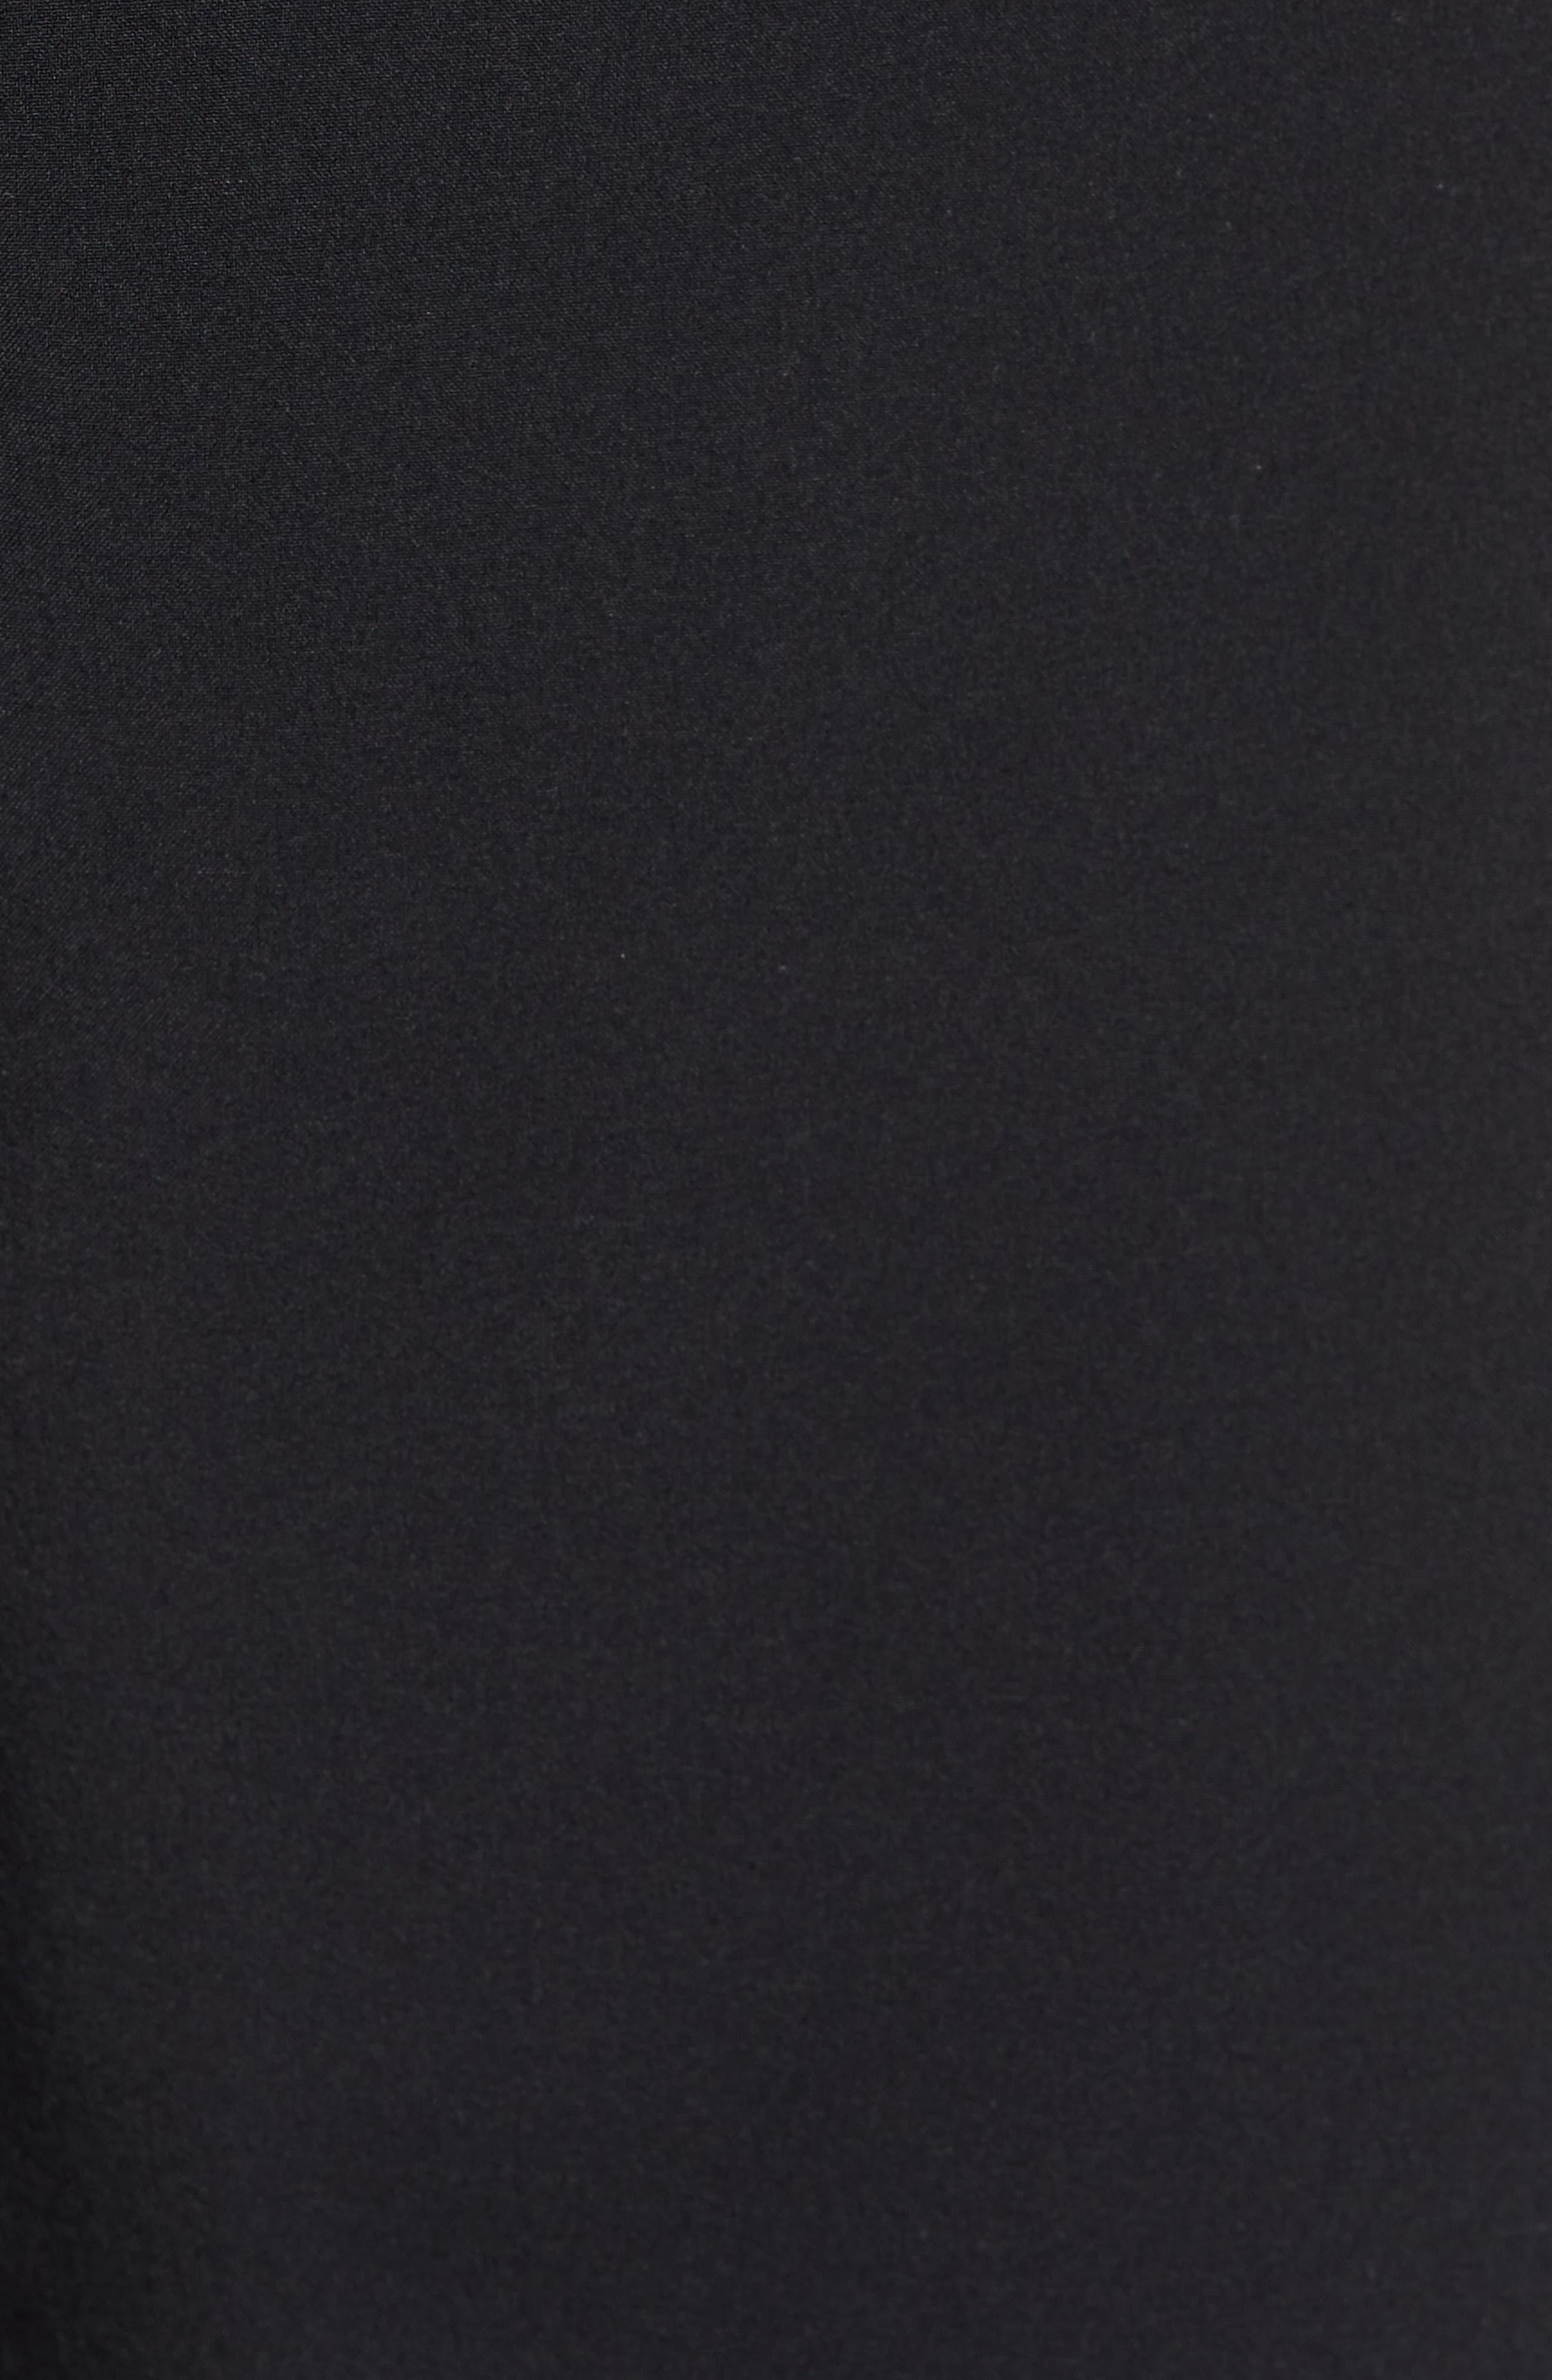 Flex Hybrid Athletic Shorts,                             Alternate thumbnail 5, color,                             Black